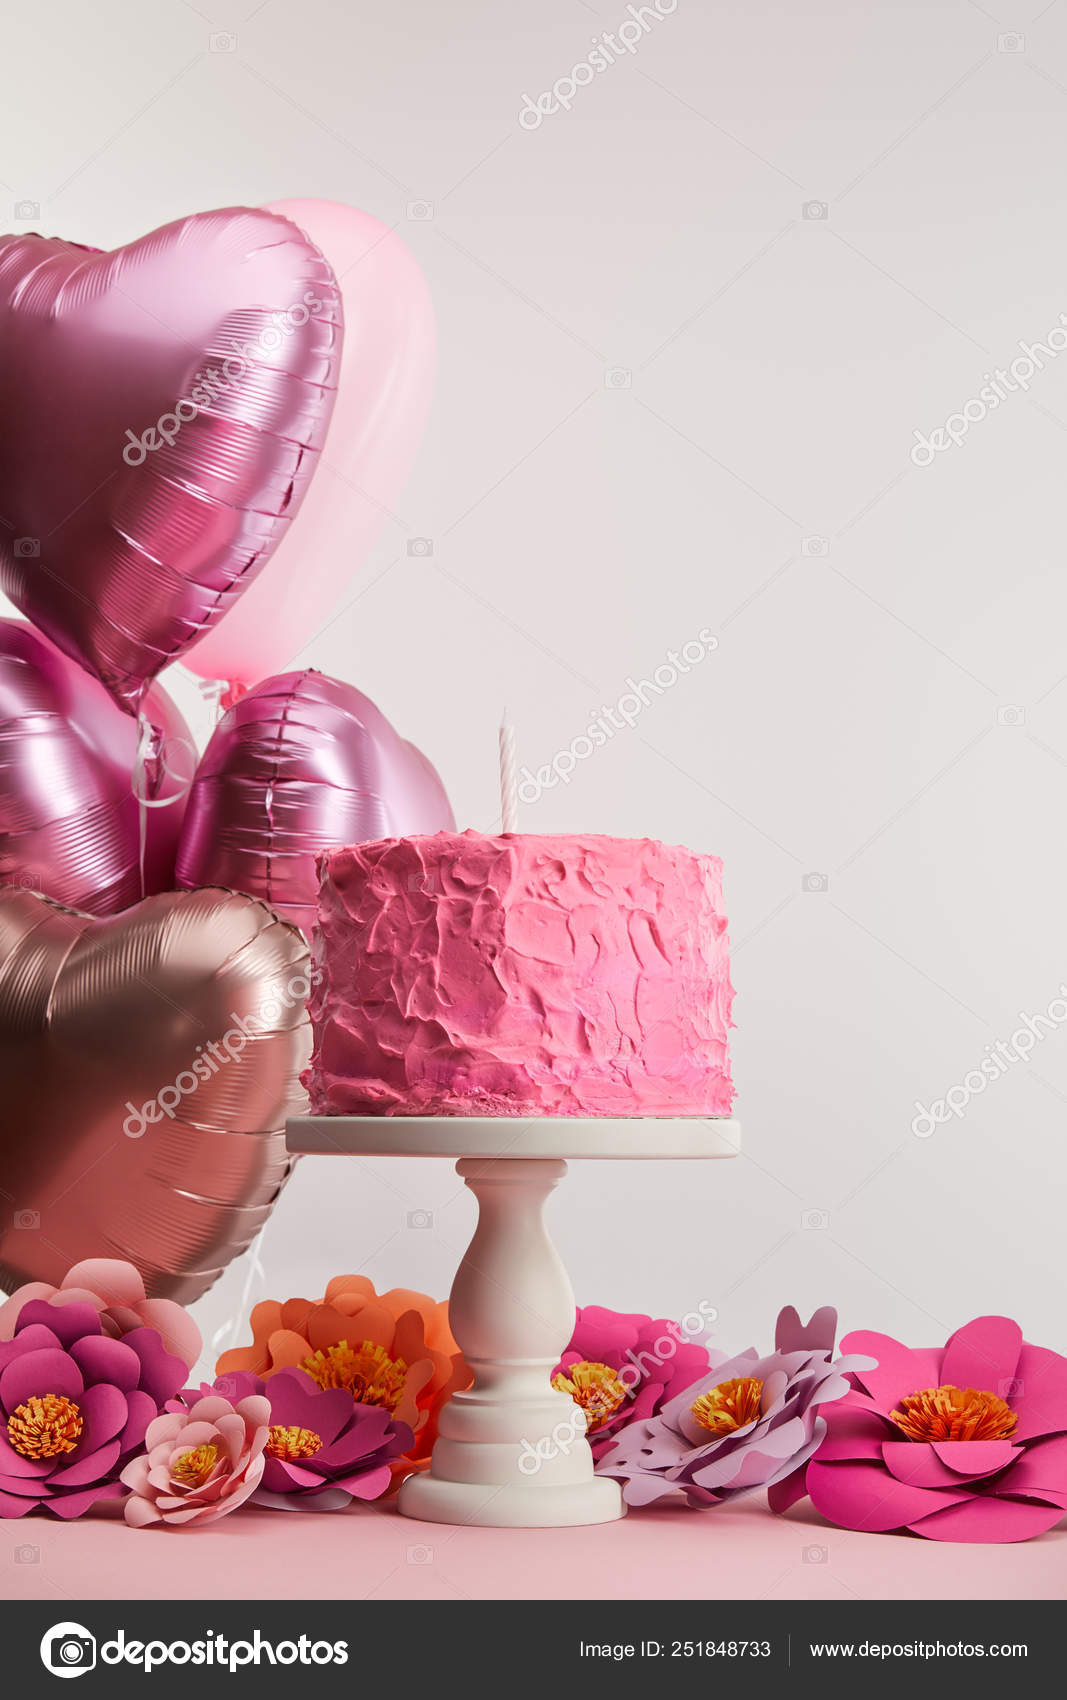 Astonishing Birthday Cake For Wife Heart Shape Pink Birthday Cake Candle Funny Birthday Cards Online Fluifree Goldxyz